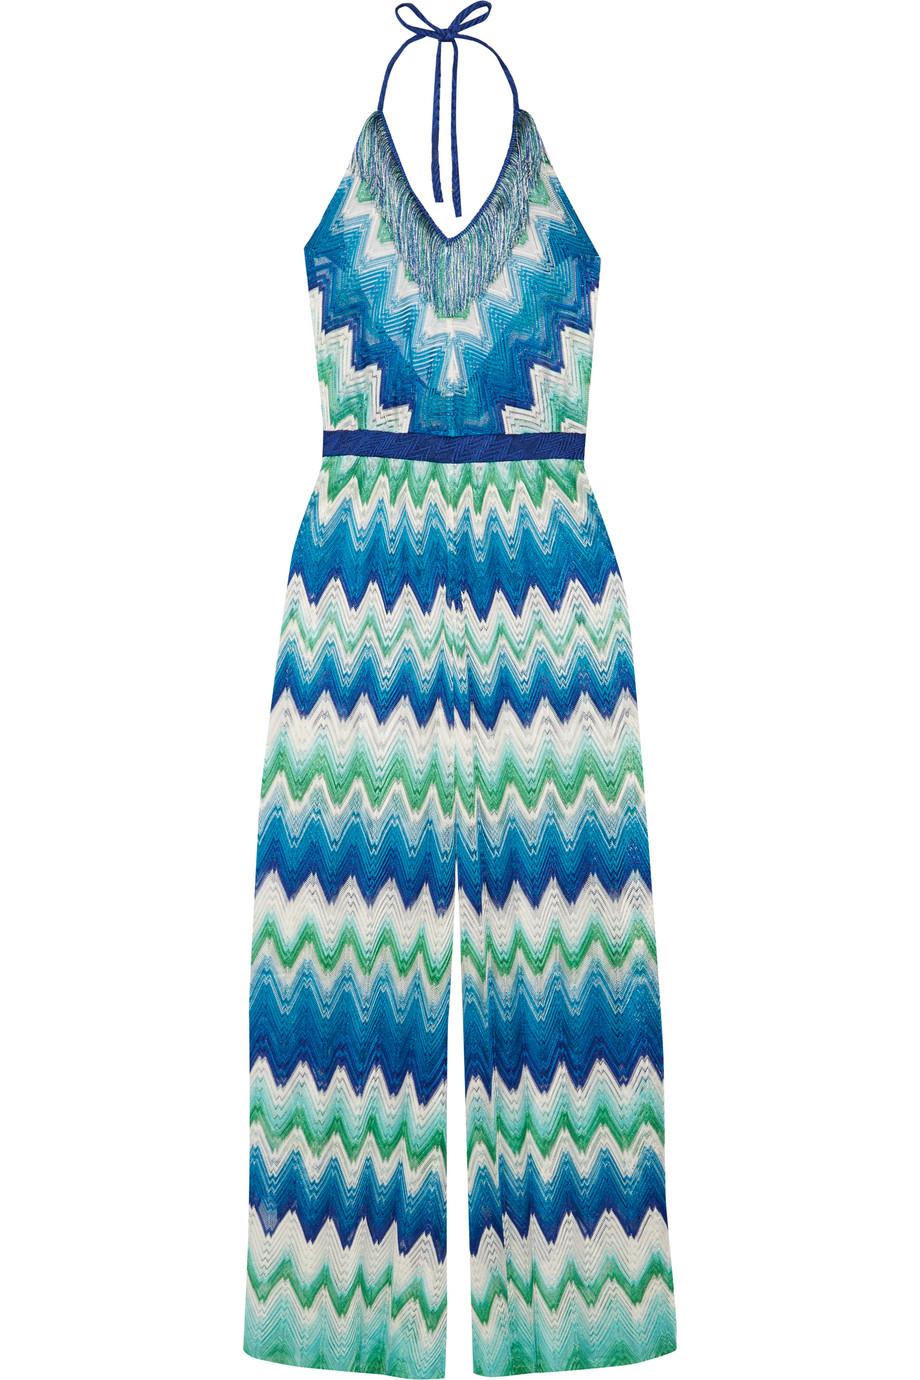 Missoni Mare Fringed Crochet-Knit Halterneck Jumpsuit, Size: 48